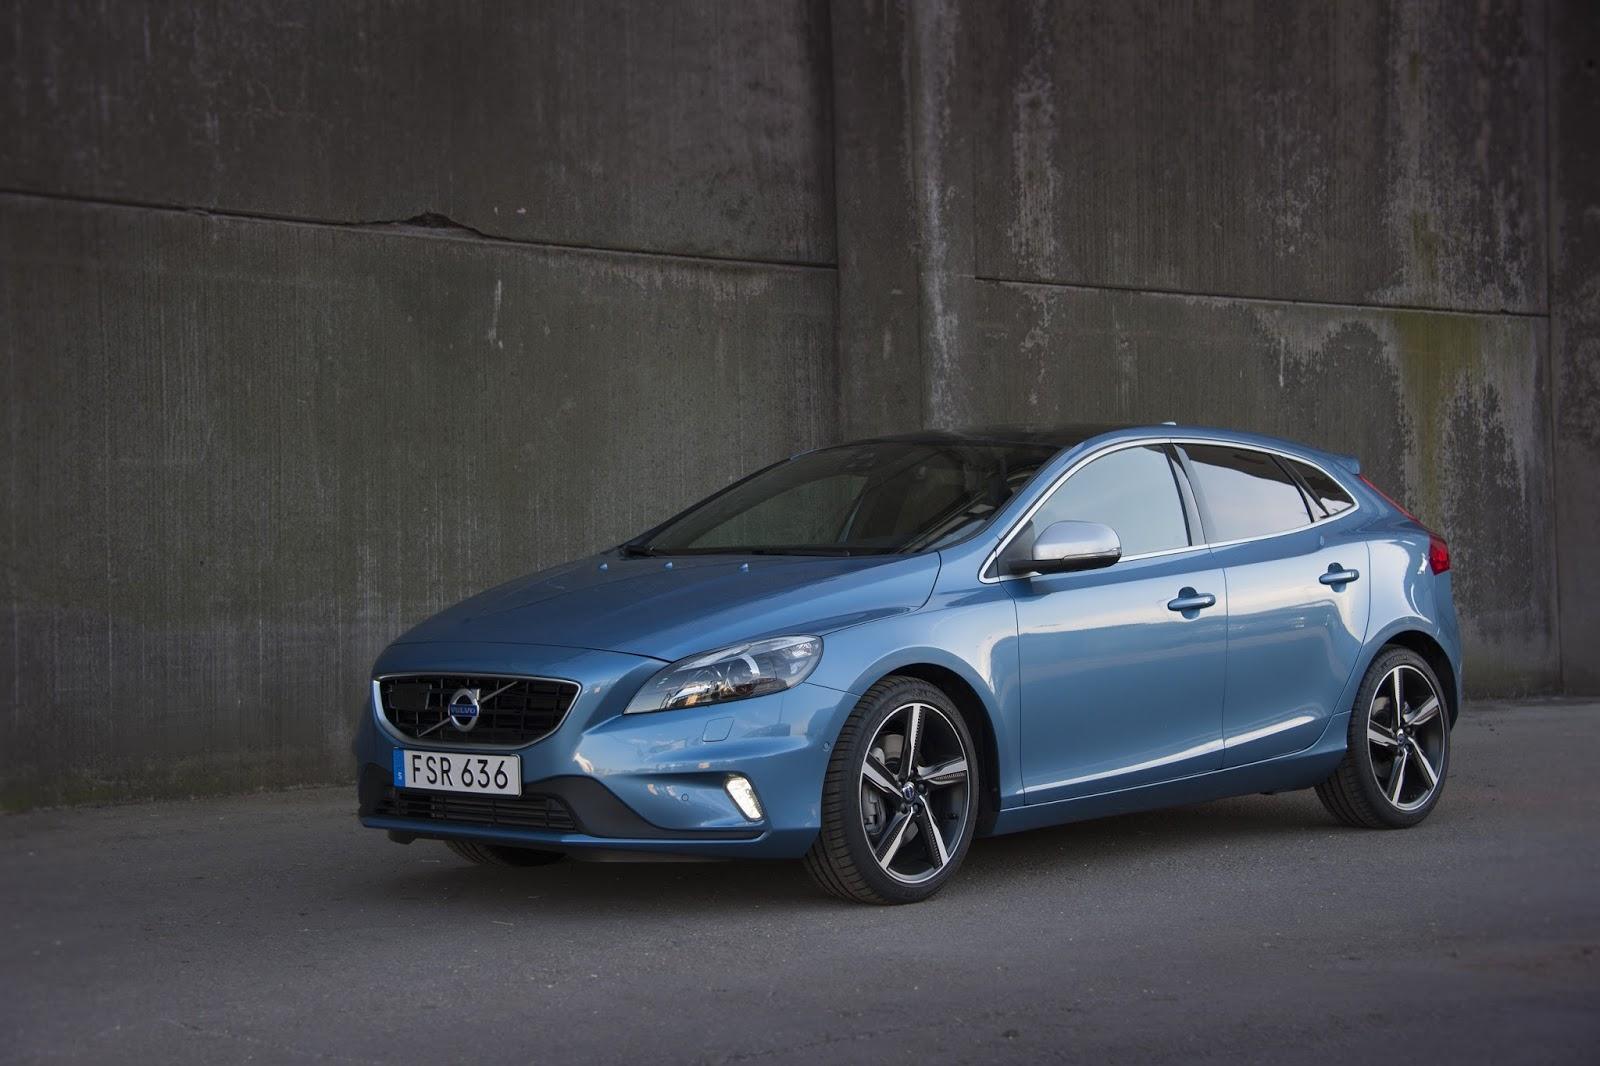 V40%2B1.5%2BT3%2BAUTO 1 Το Volvo V40 Cross Country με το νέο κινητήρα 1,5 λίτρων, απόδοσης 152 ίππων από 21.900 €